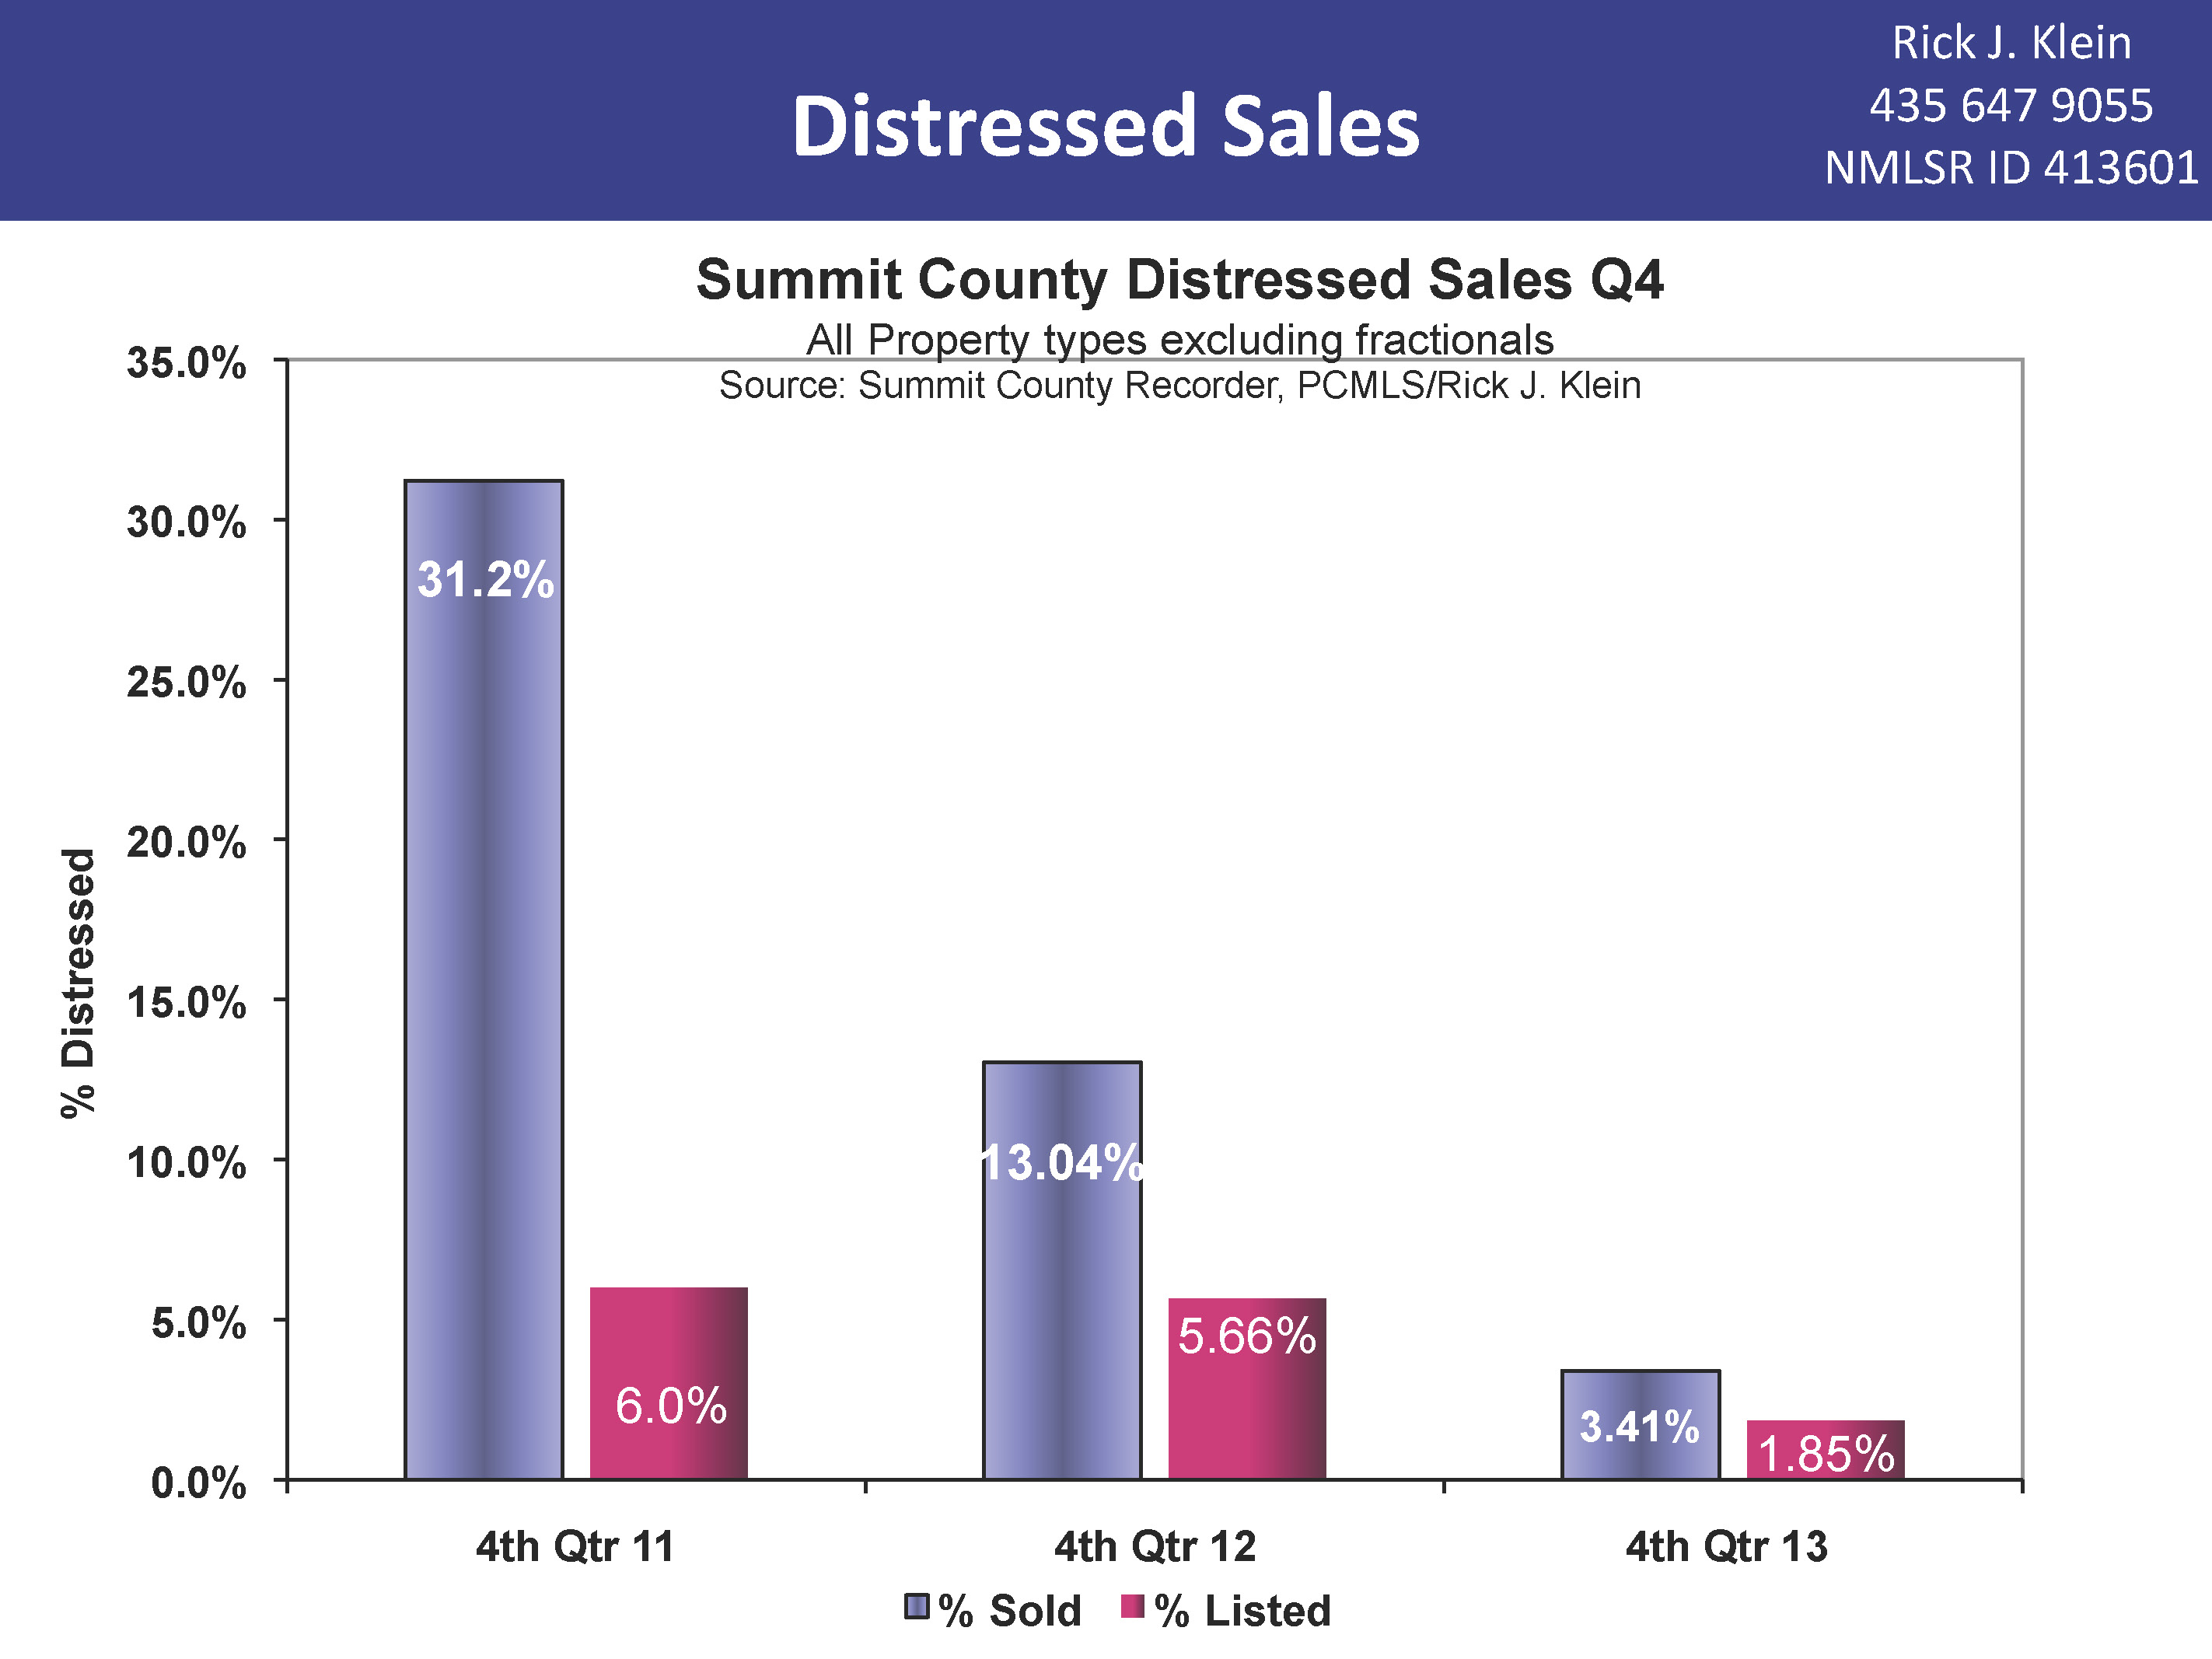 Summit County Distressed Sales Comparison